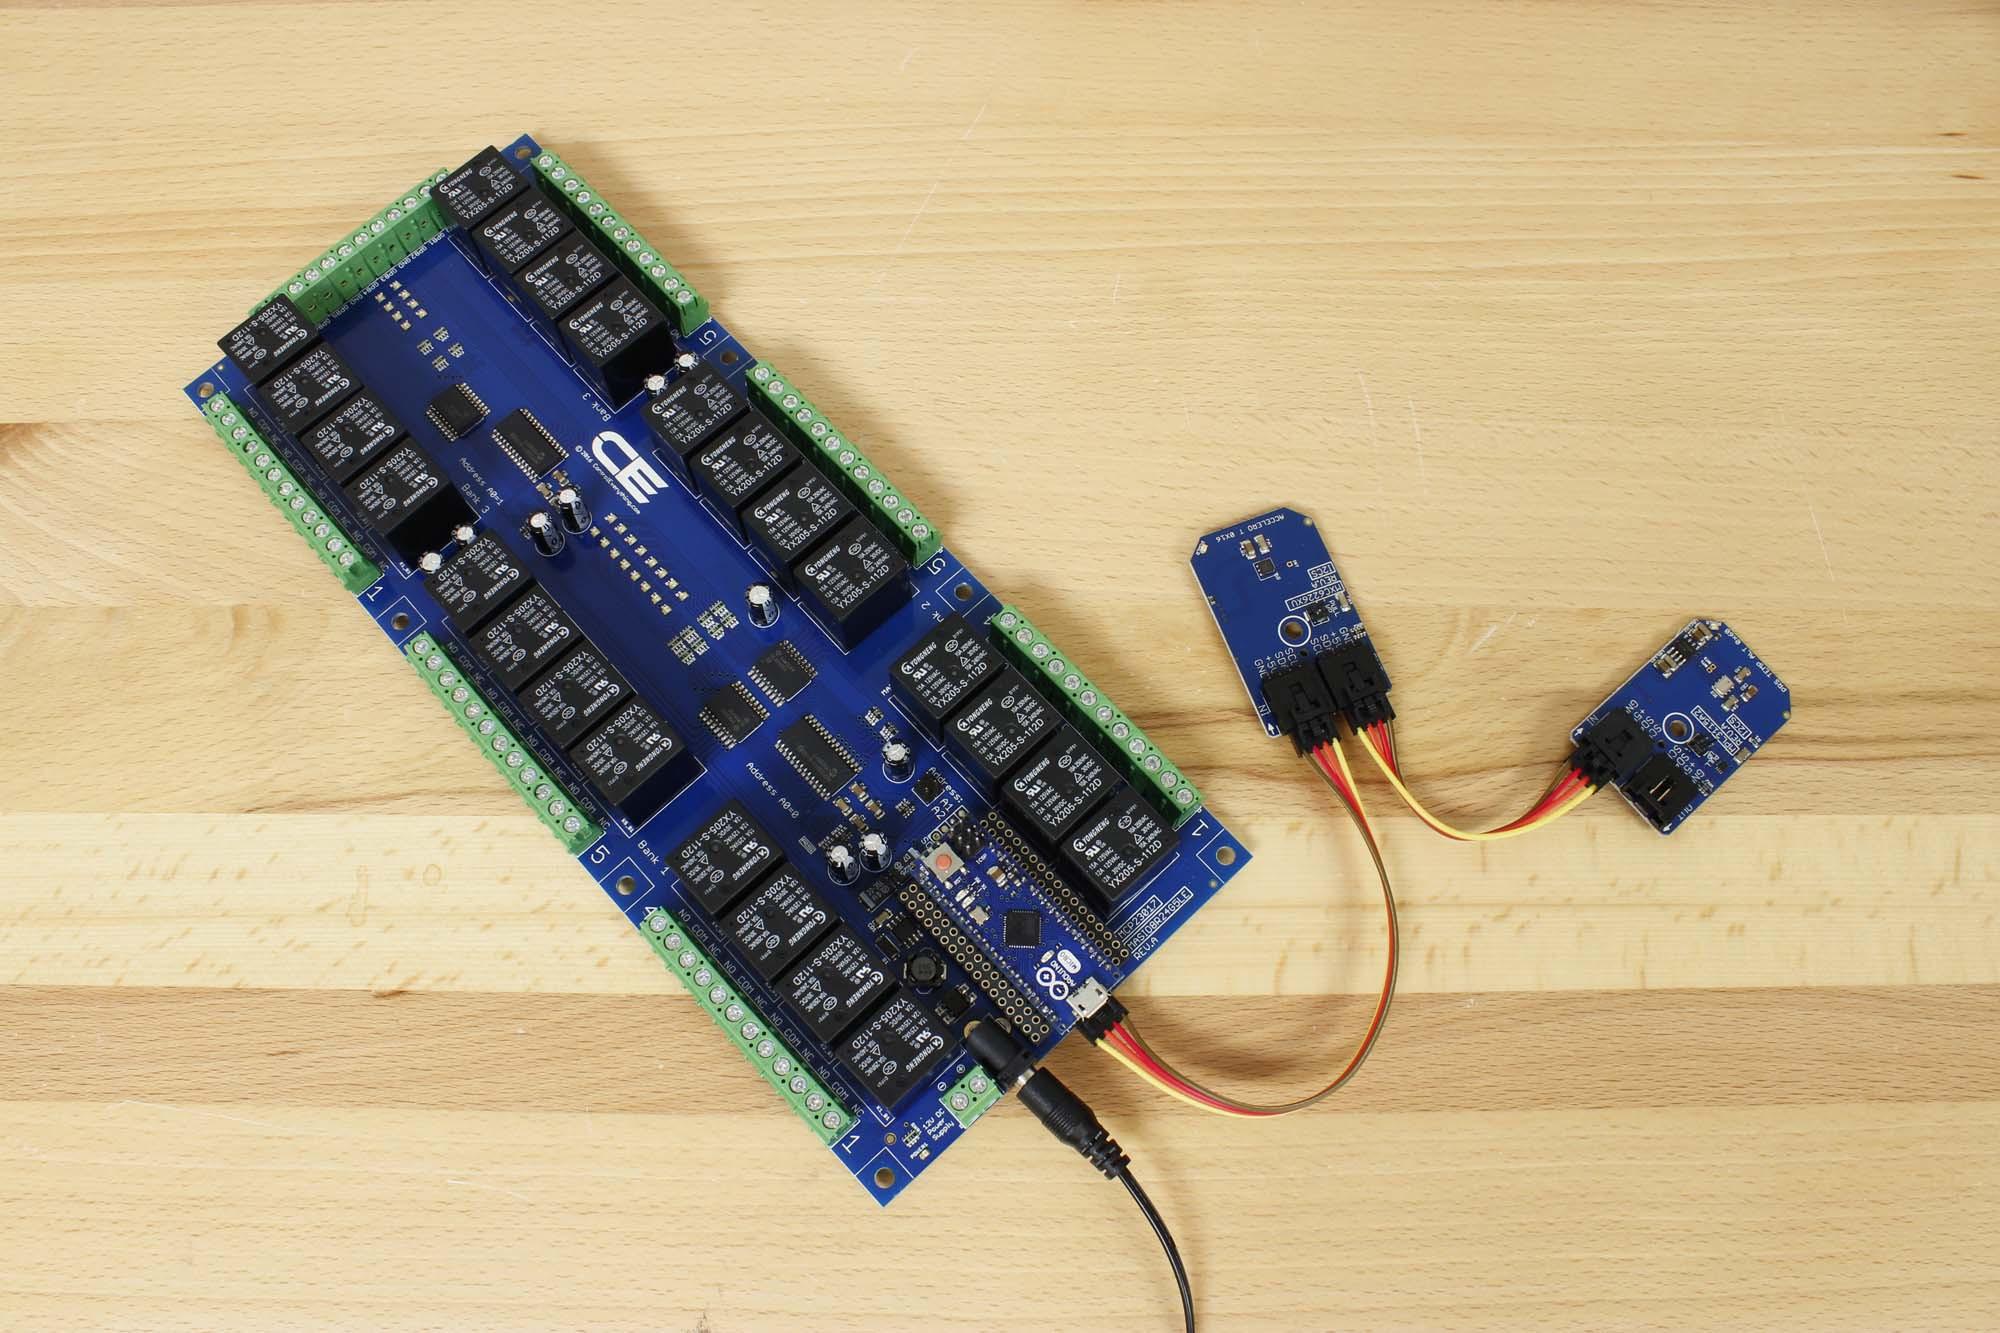 Mxc6226xu Digital Thermal Orientation Accelerometer Shock Sensor Amplifier Controlled Arduino Relay Controller